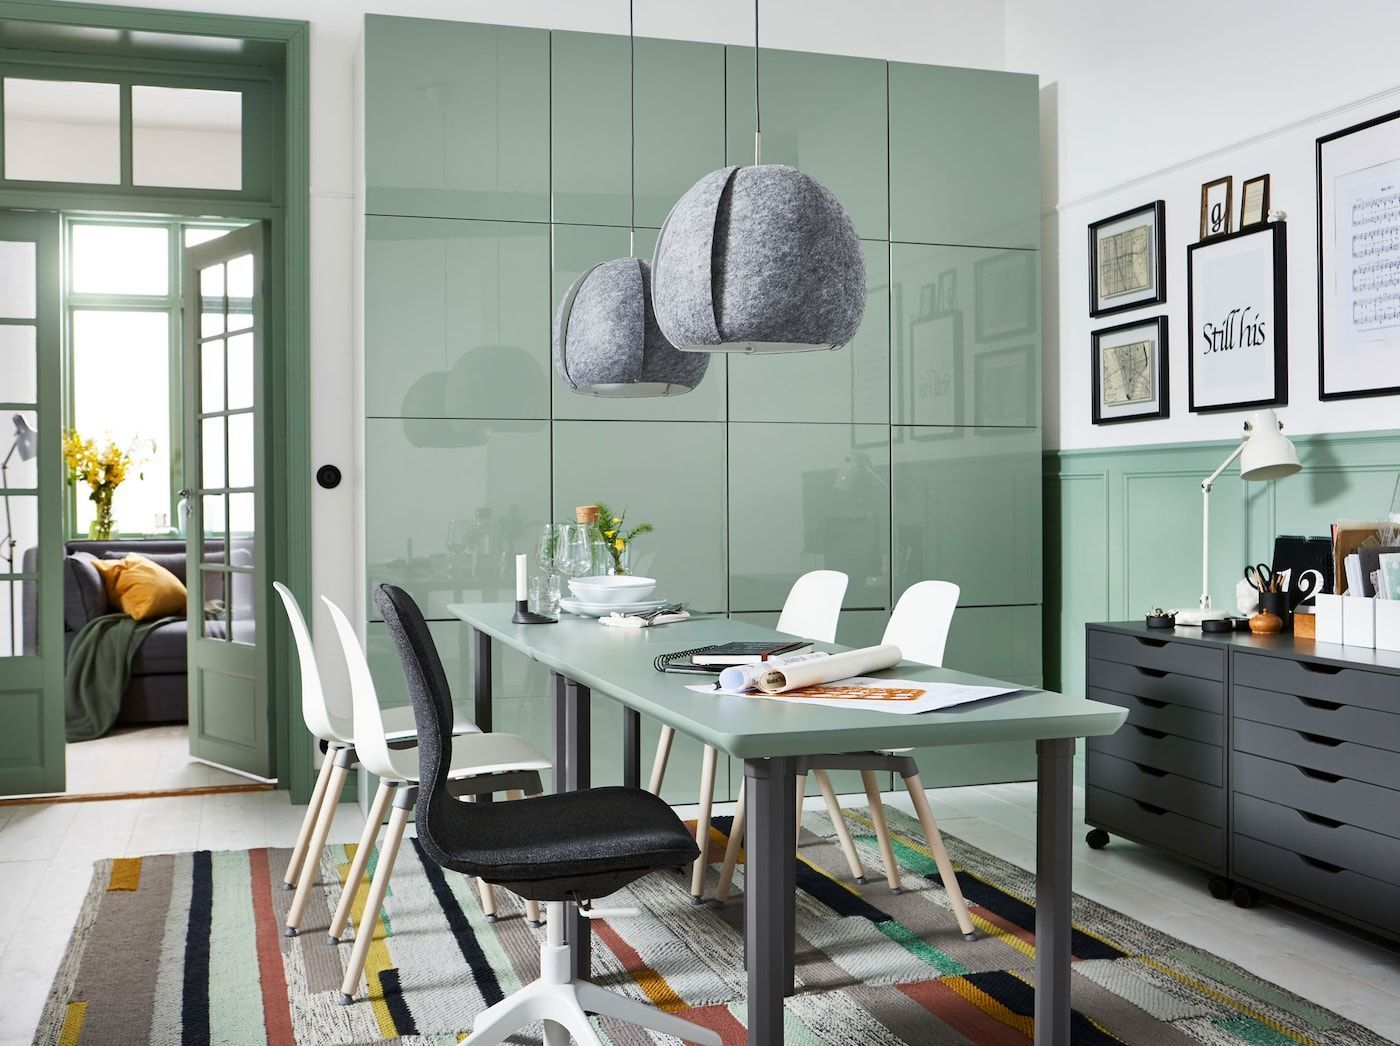 Arbeitszimmer Ideen Inspirationen Arbeitszimmer Ideen Inspirationen Smallofficeinter In 2020 Home Office Space Ikea Home Office Gray Home Offices